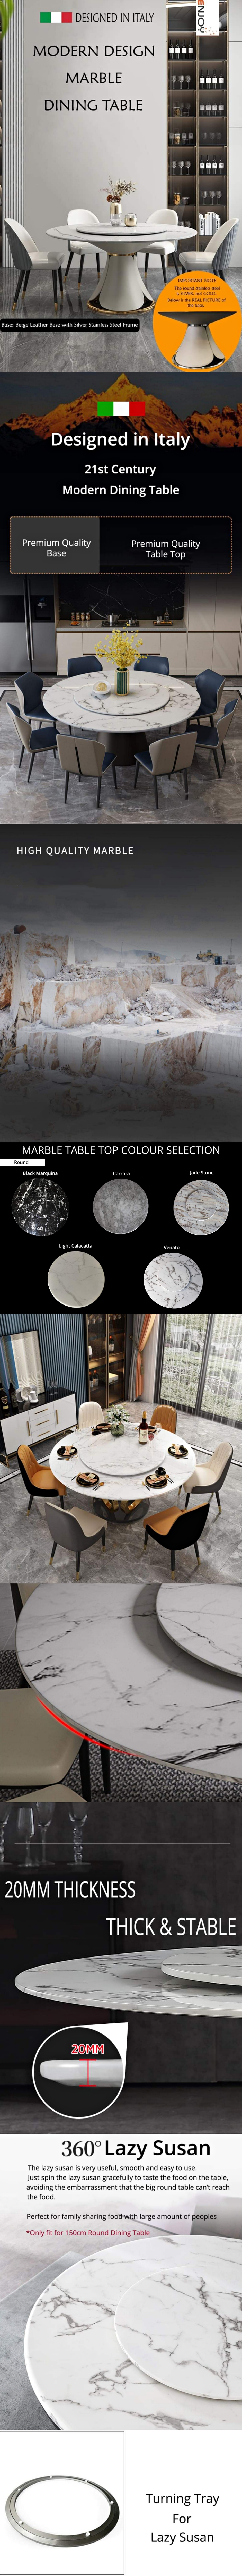 Round-Lotus-Base-Dining-Table-Item-Description-1